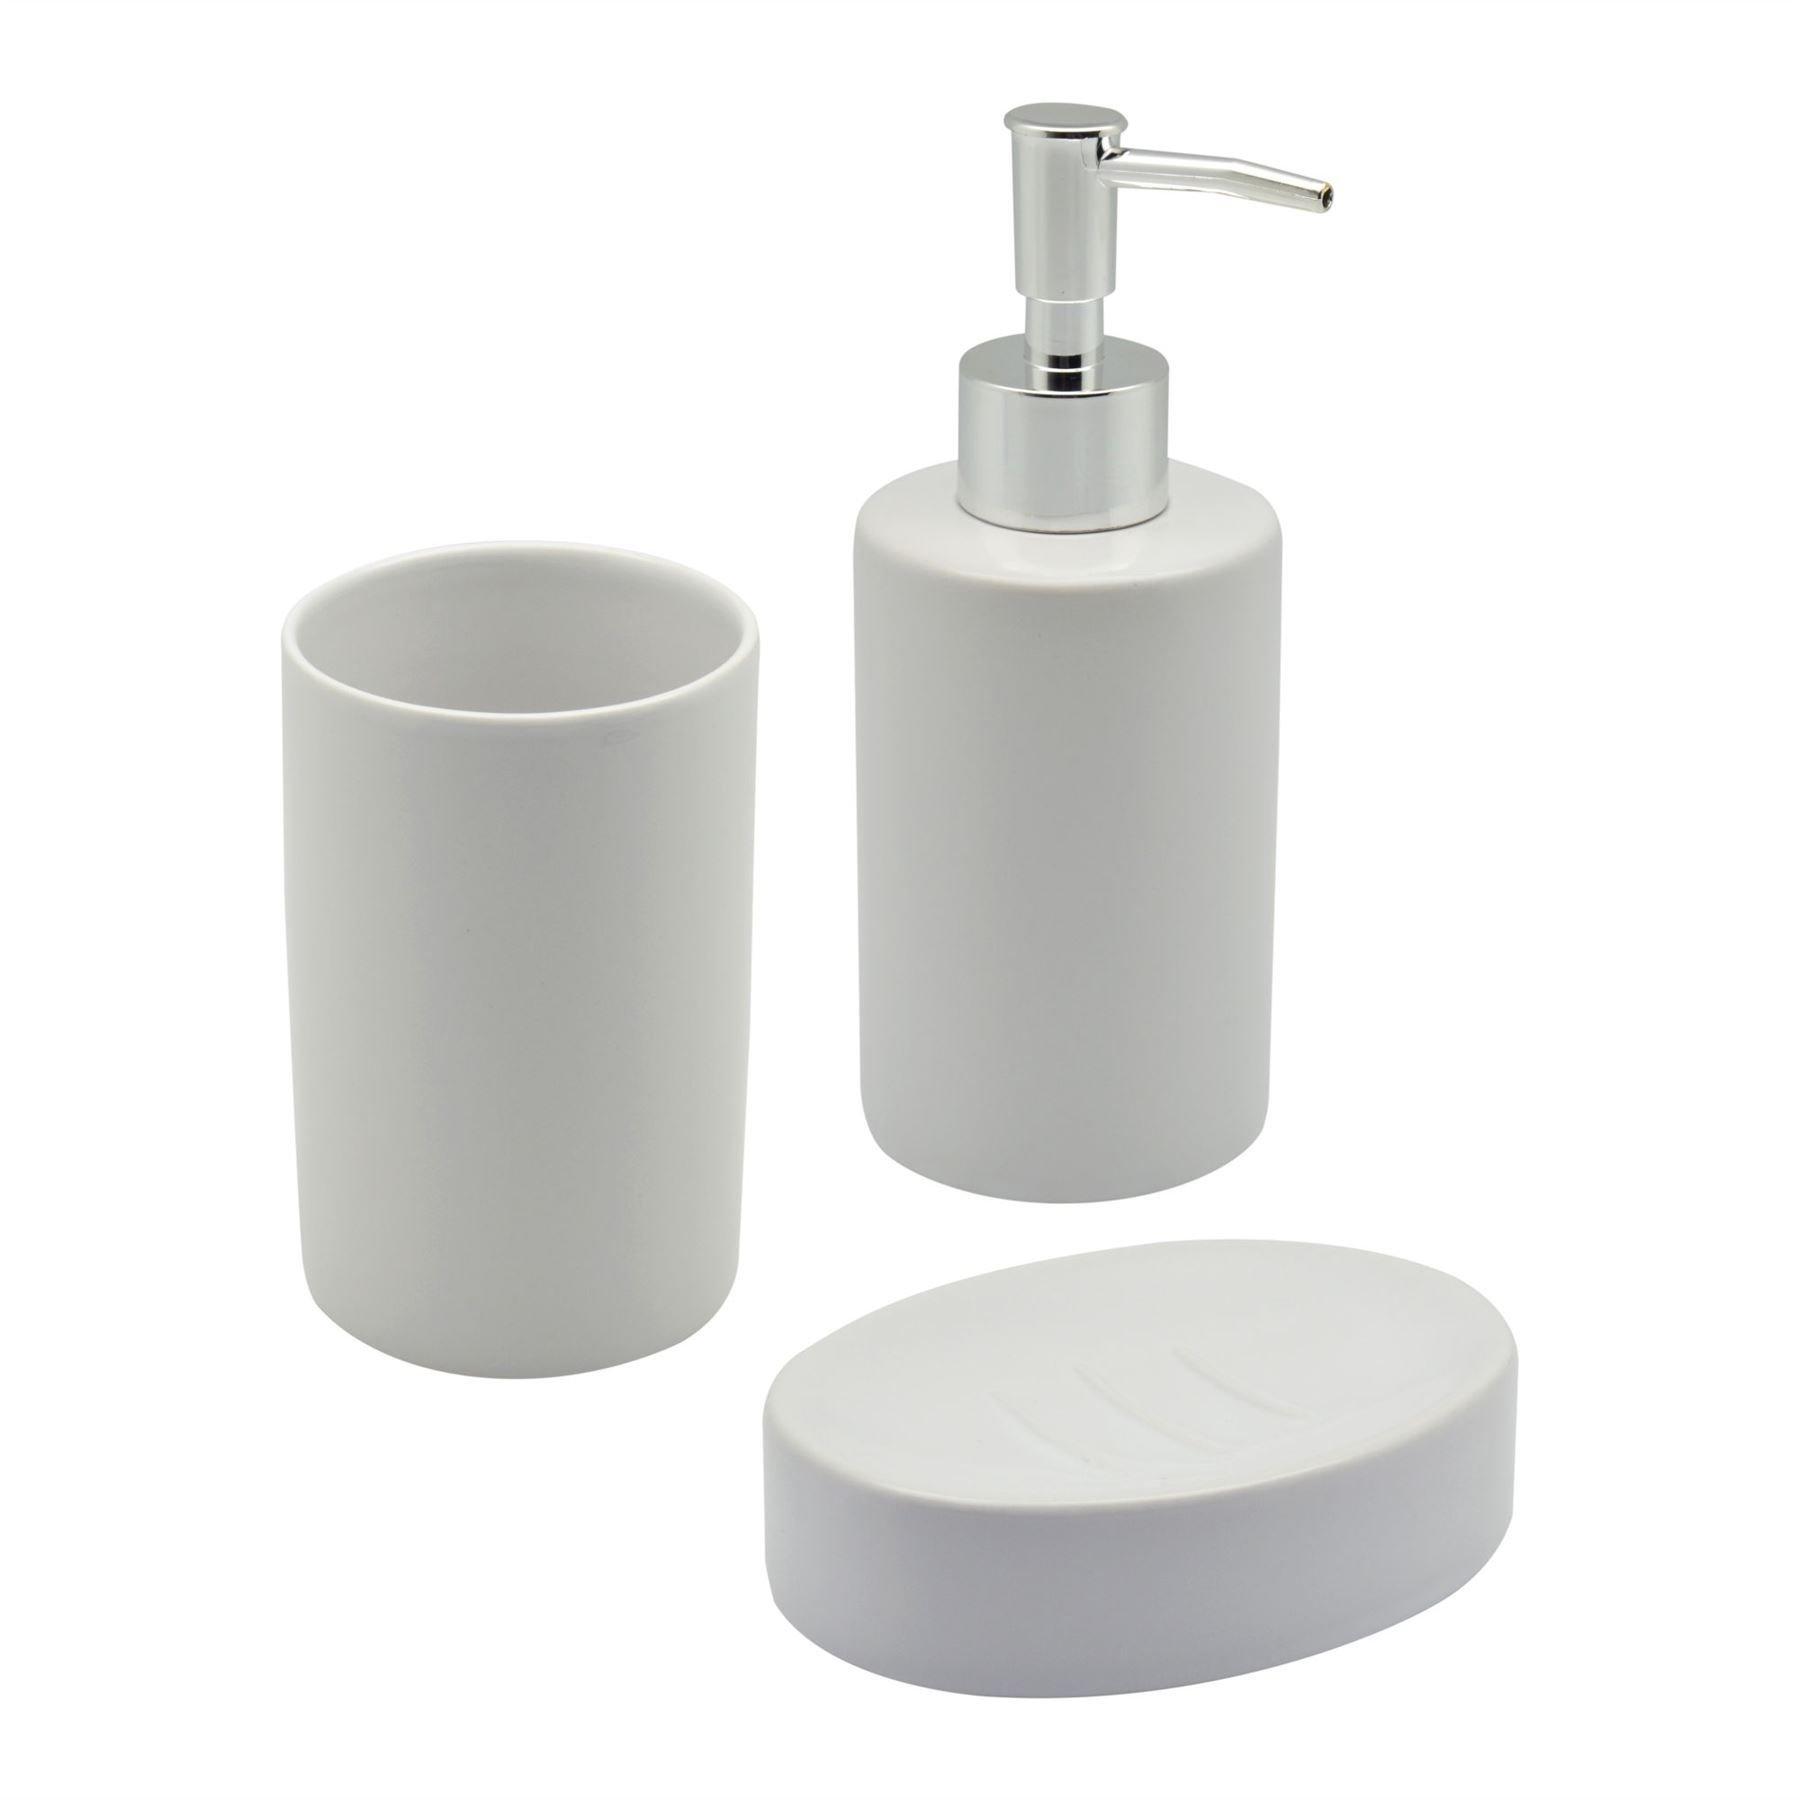 Soap Dish and Dispenser Bathrooms: Amazon.co.uk